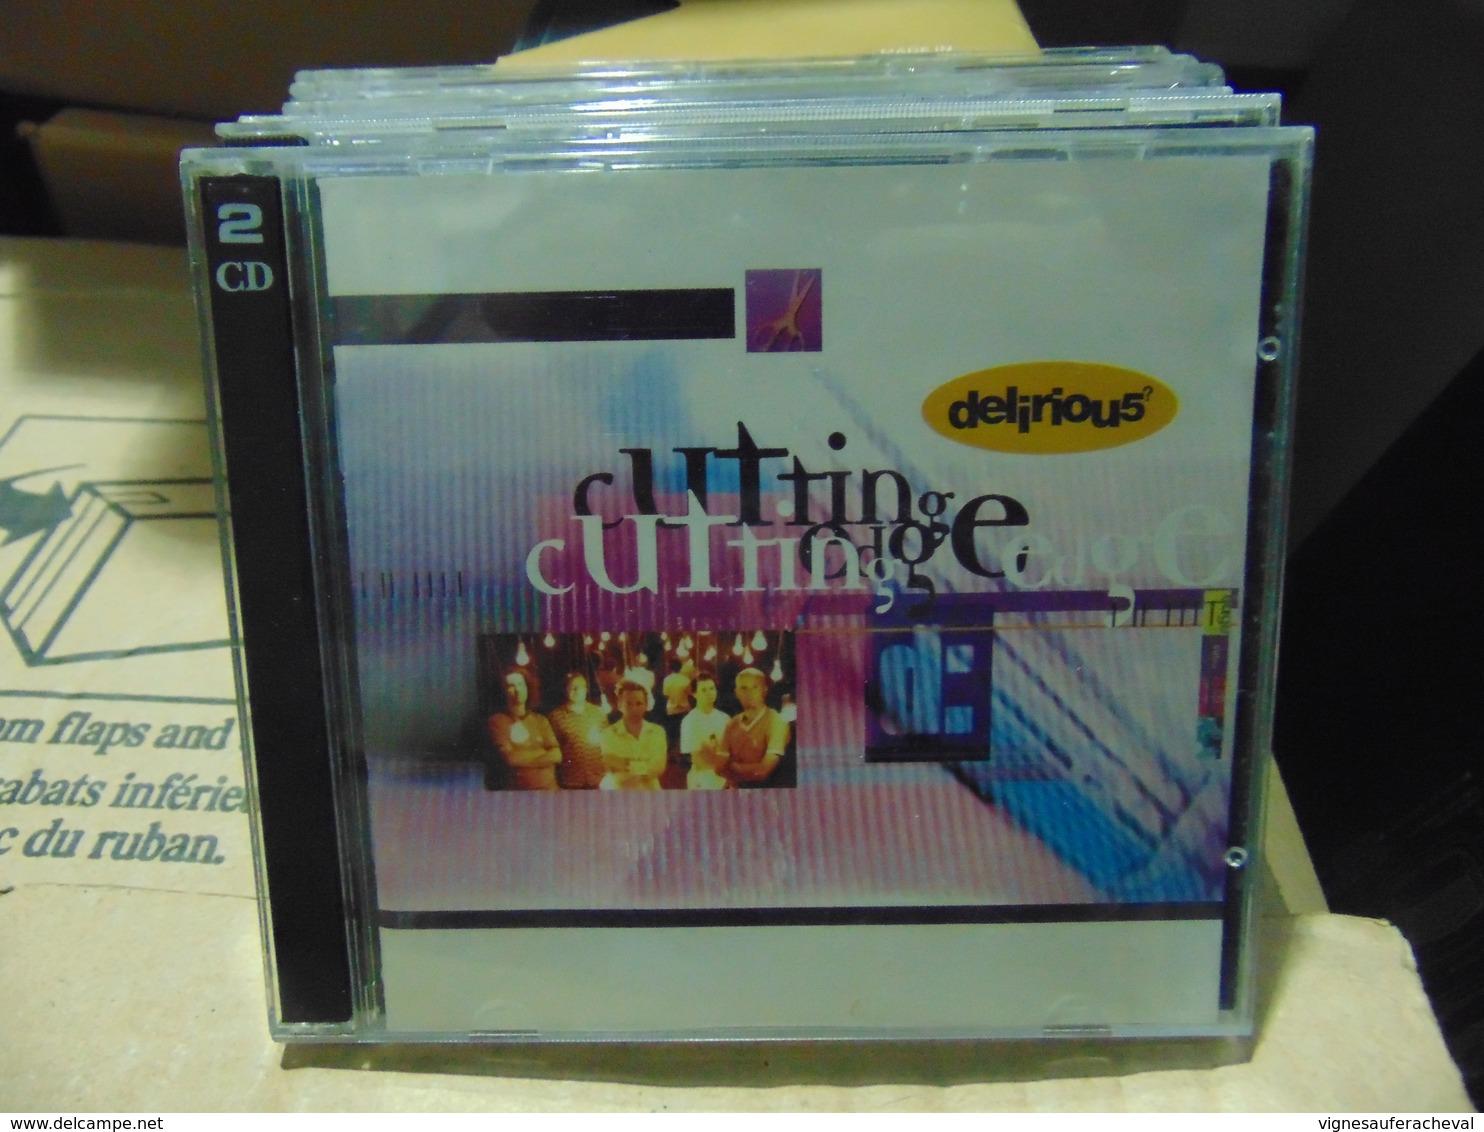 Delirious?- Cutting Edge (2 CD) - Musik & Instrumente